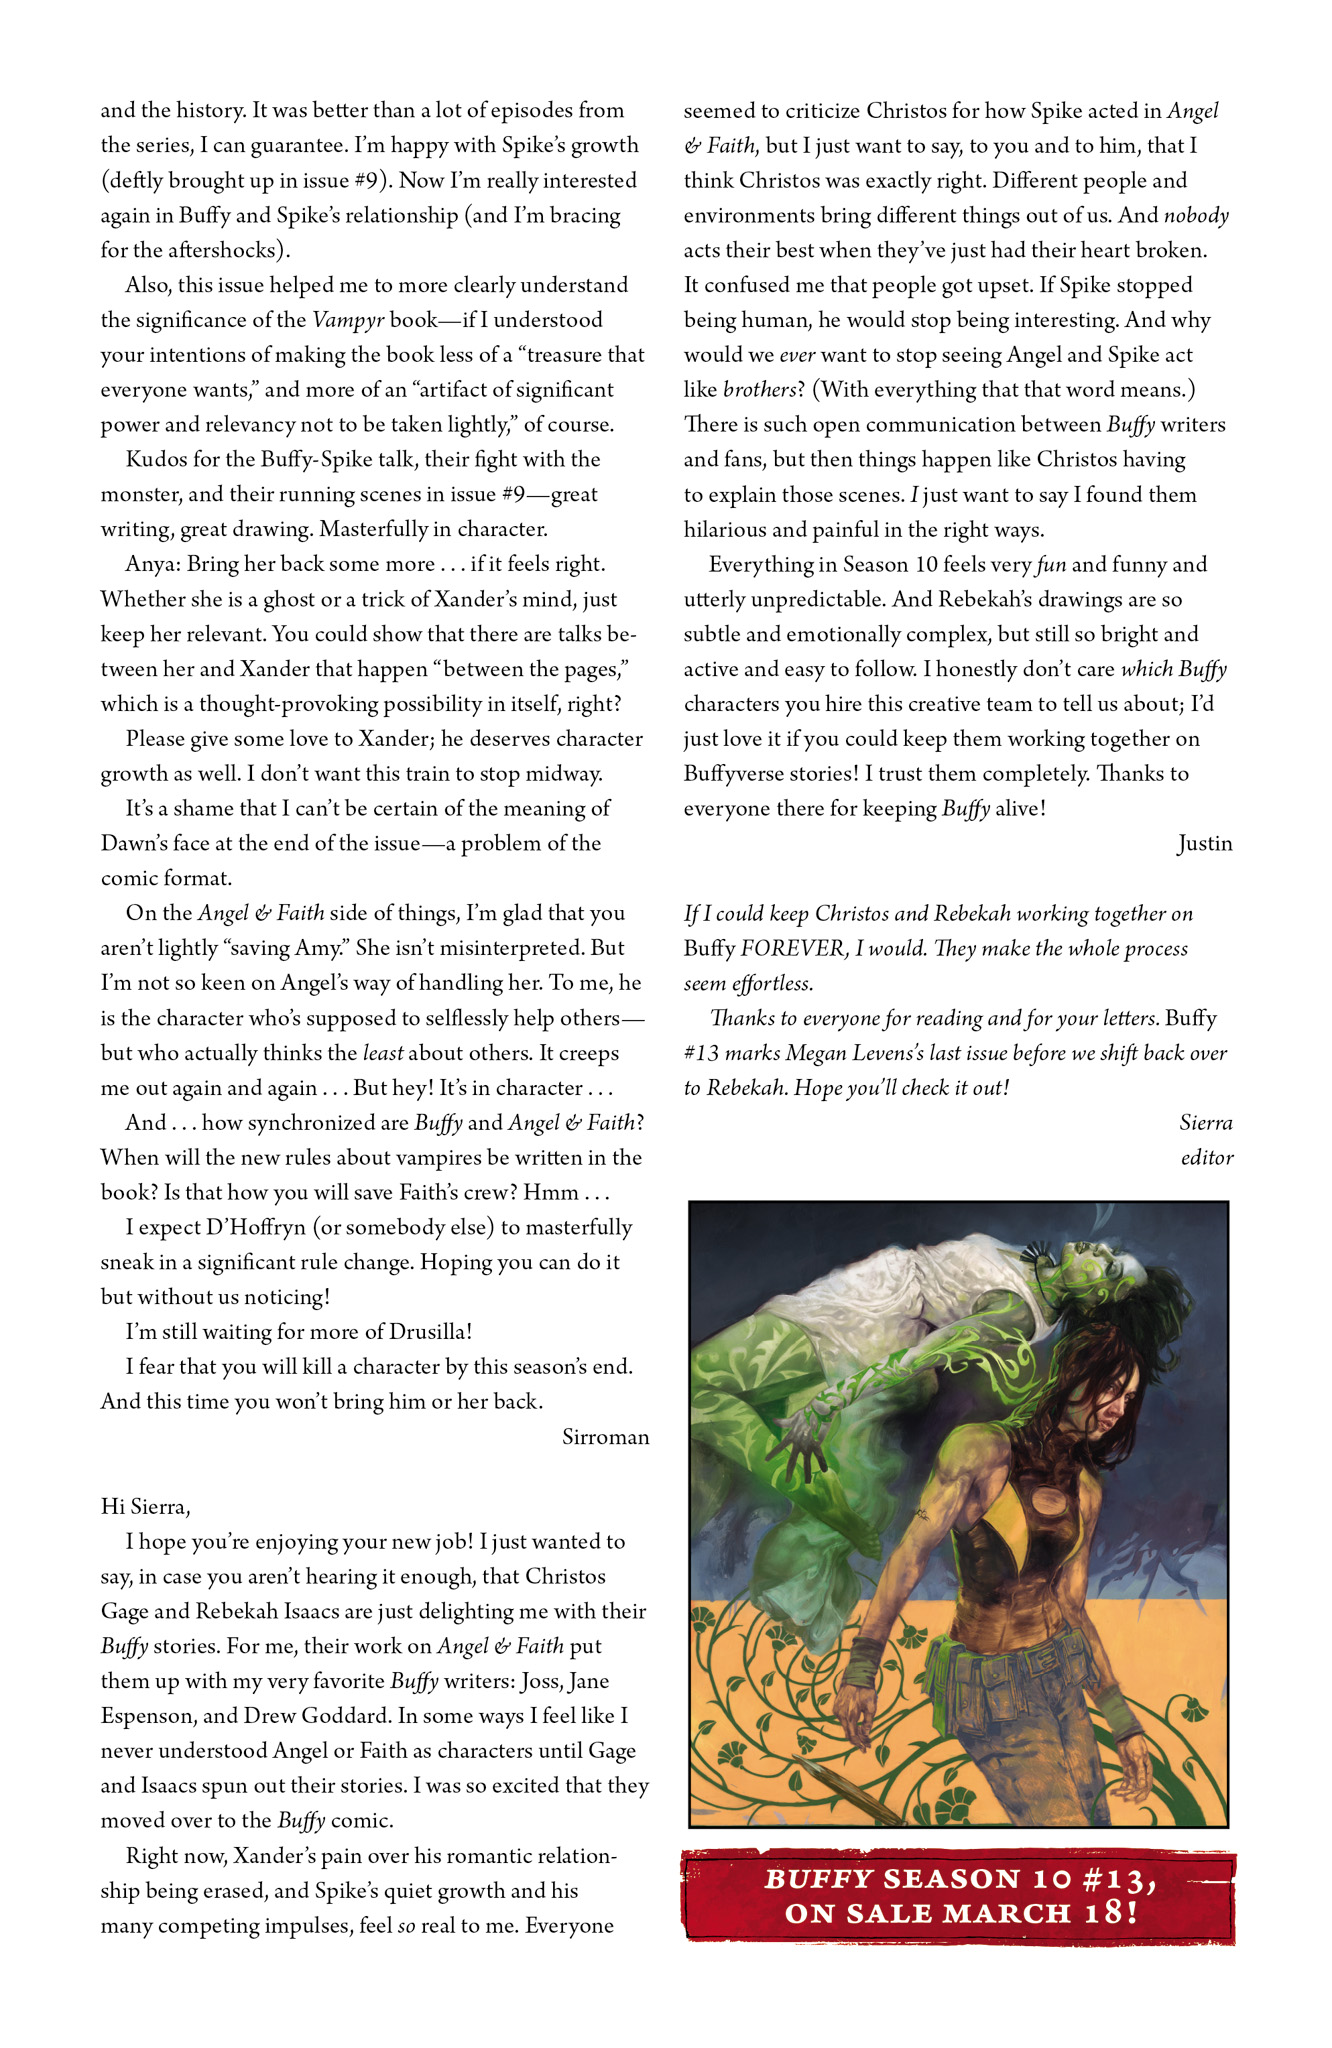 Read online Angel & Faith Season 10 comic -  Issue #12 - 26